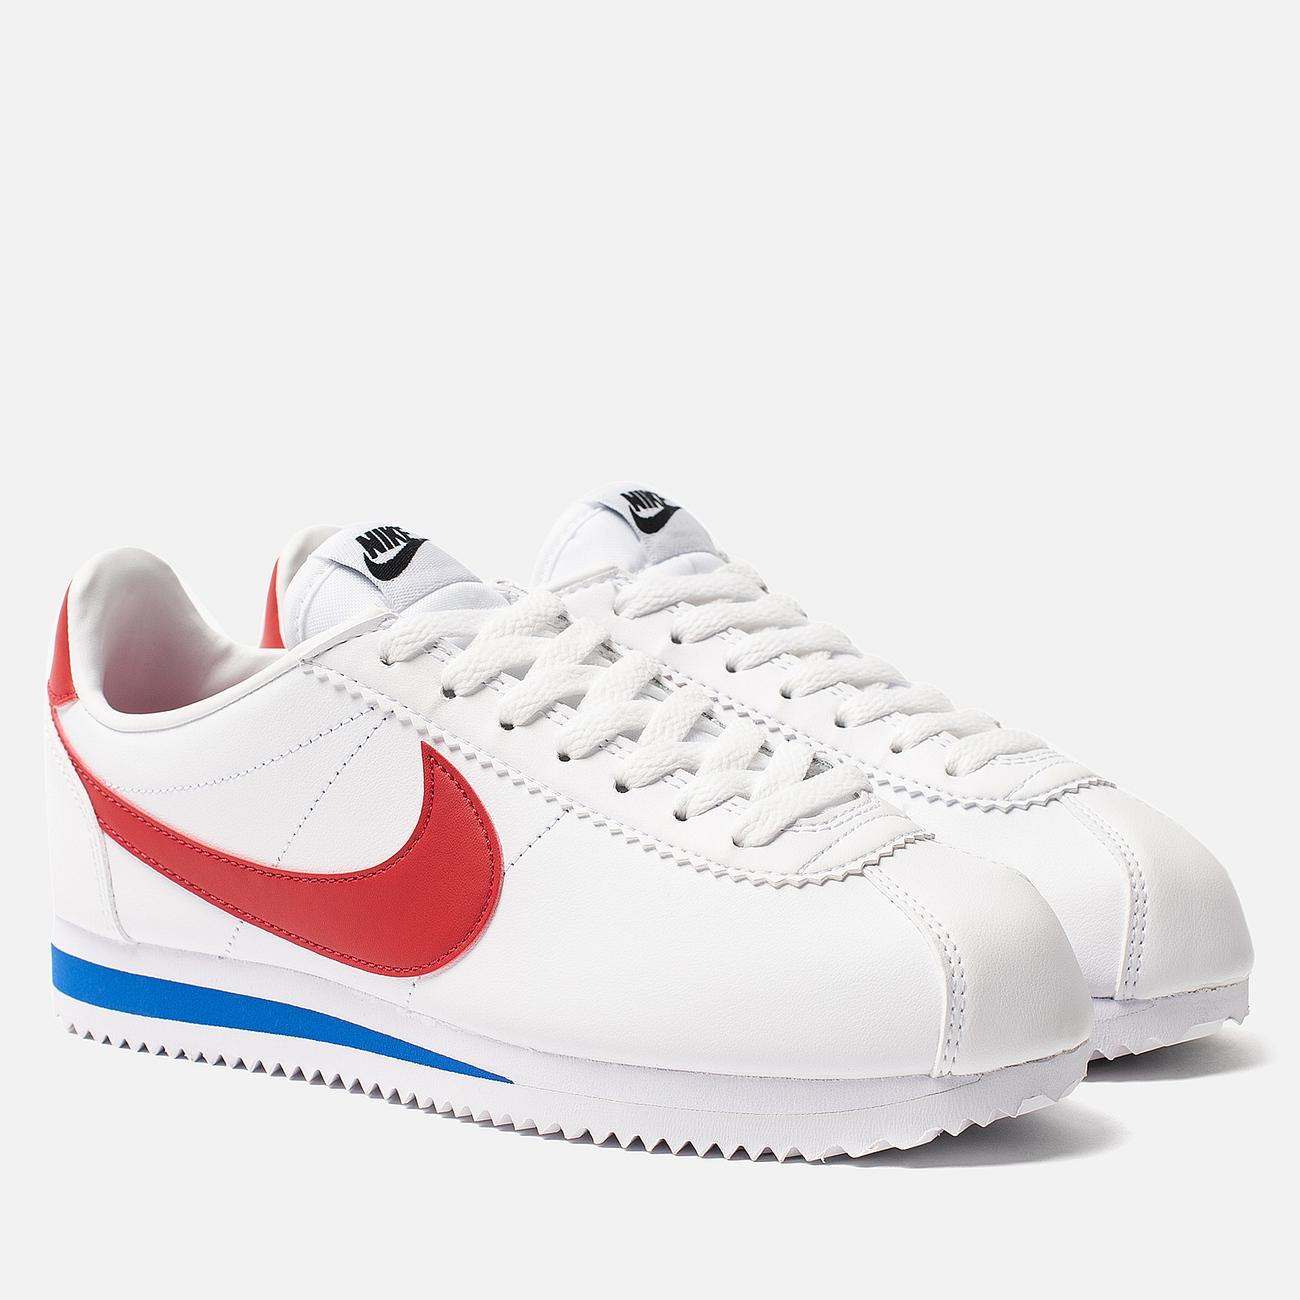 Женские кроссовки Nike Classic Cortez Leather White/Varsity Red/Varsity Royal